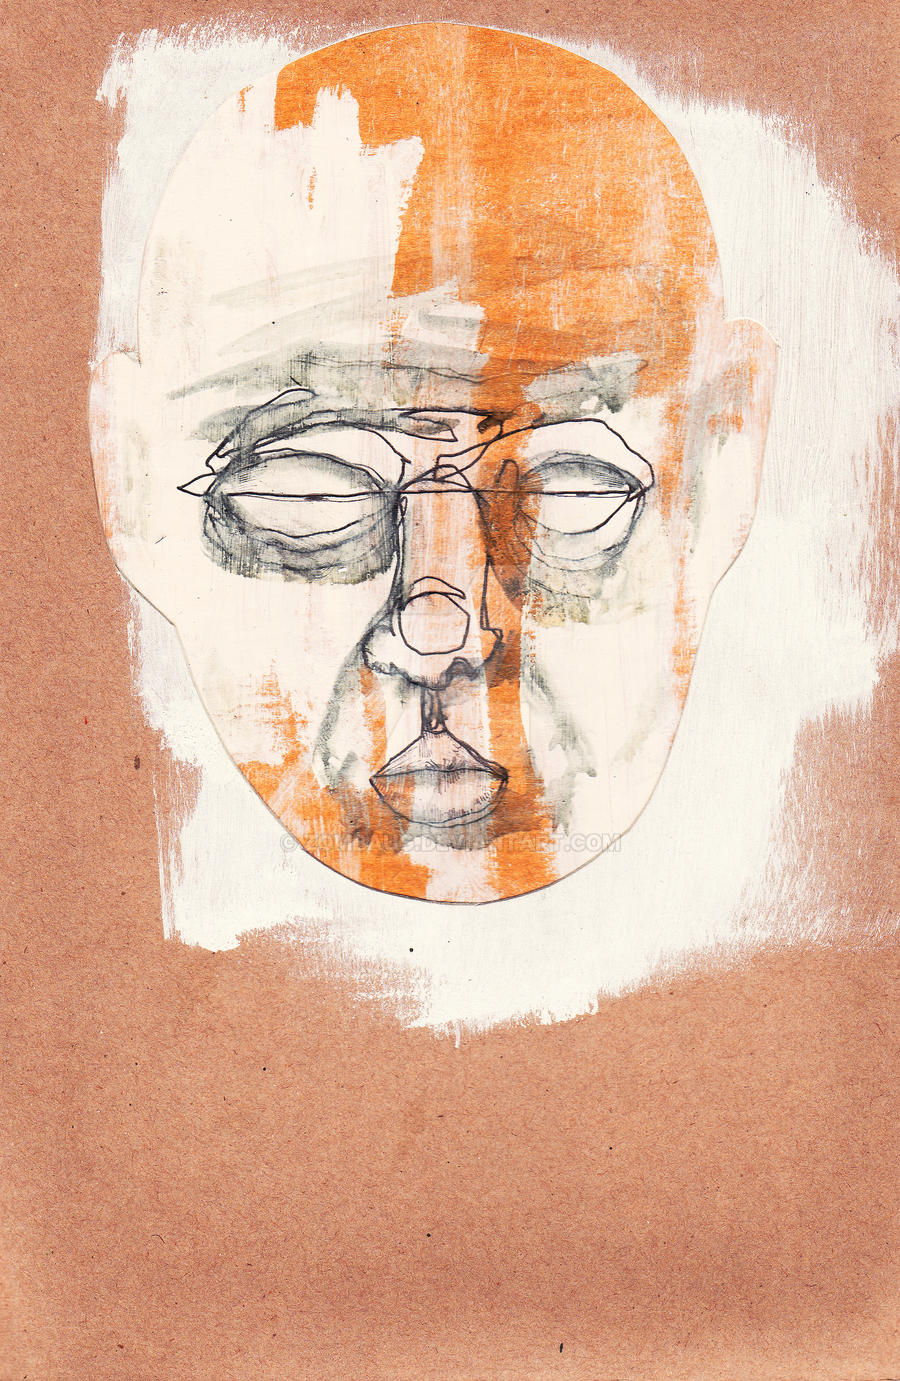 Untitled Face Study 5 by ZombAug